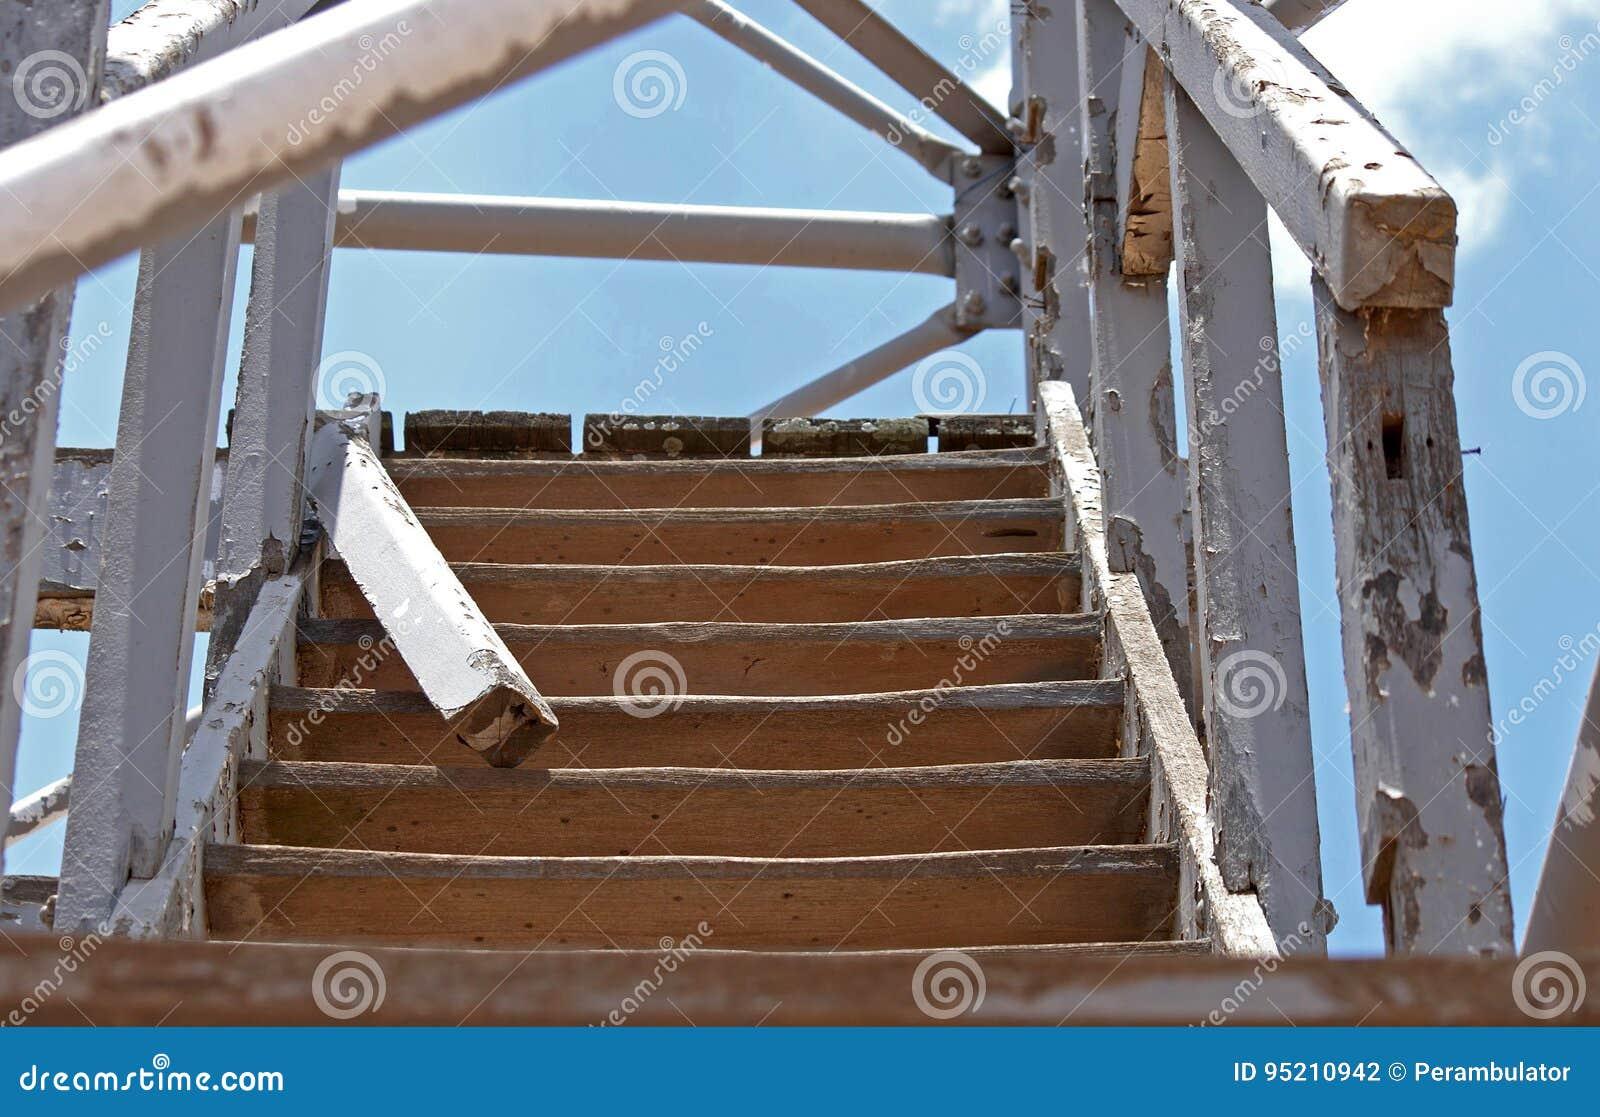 Escaleras exteriores de madera ideas para usar la madera - Escalera madera exterior ...